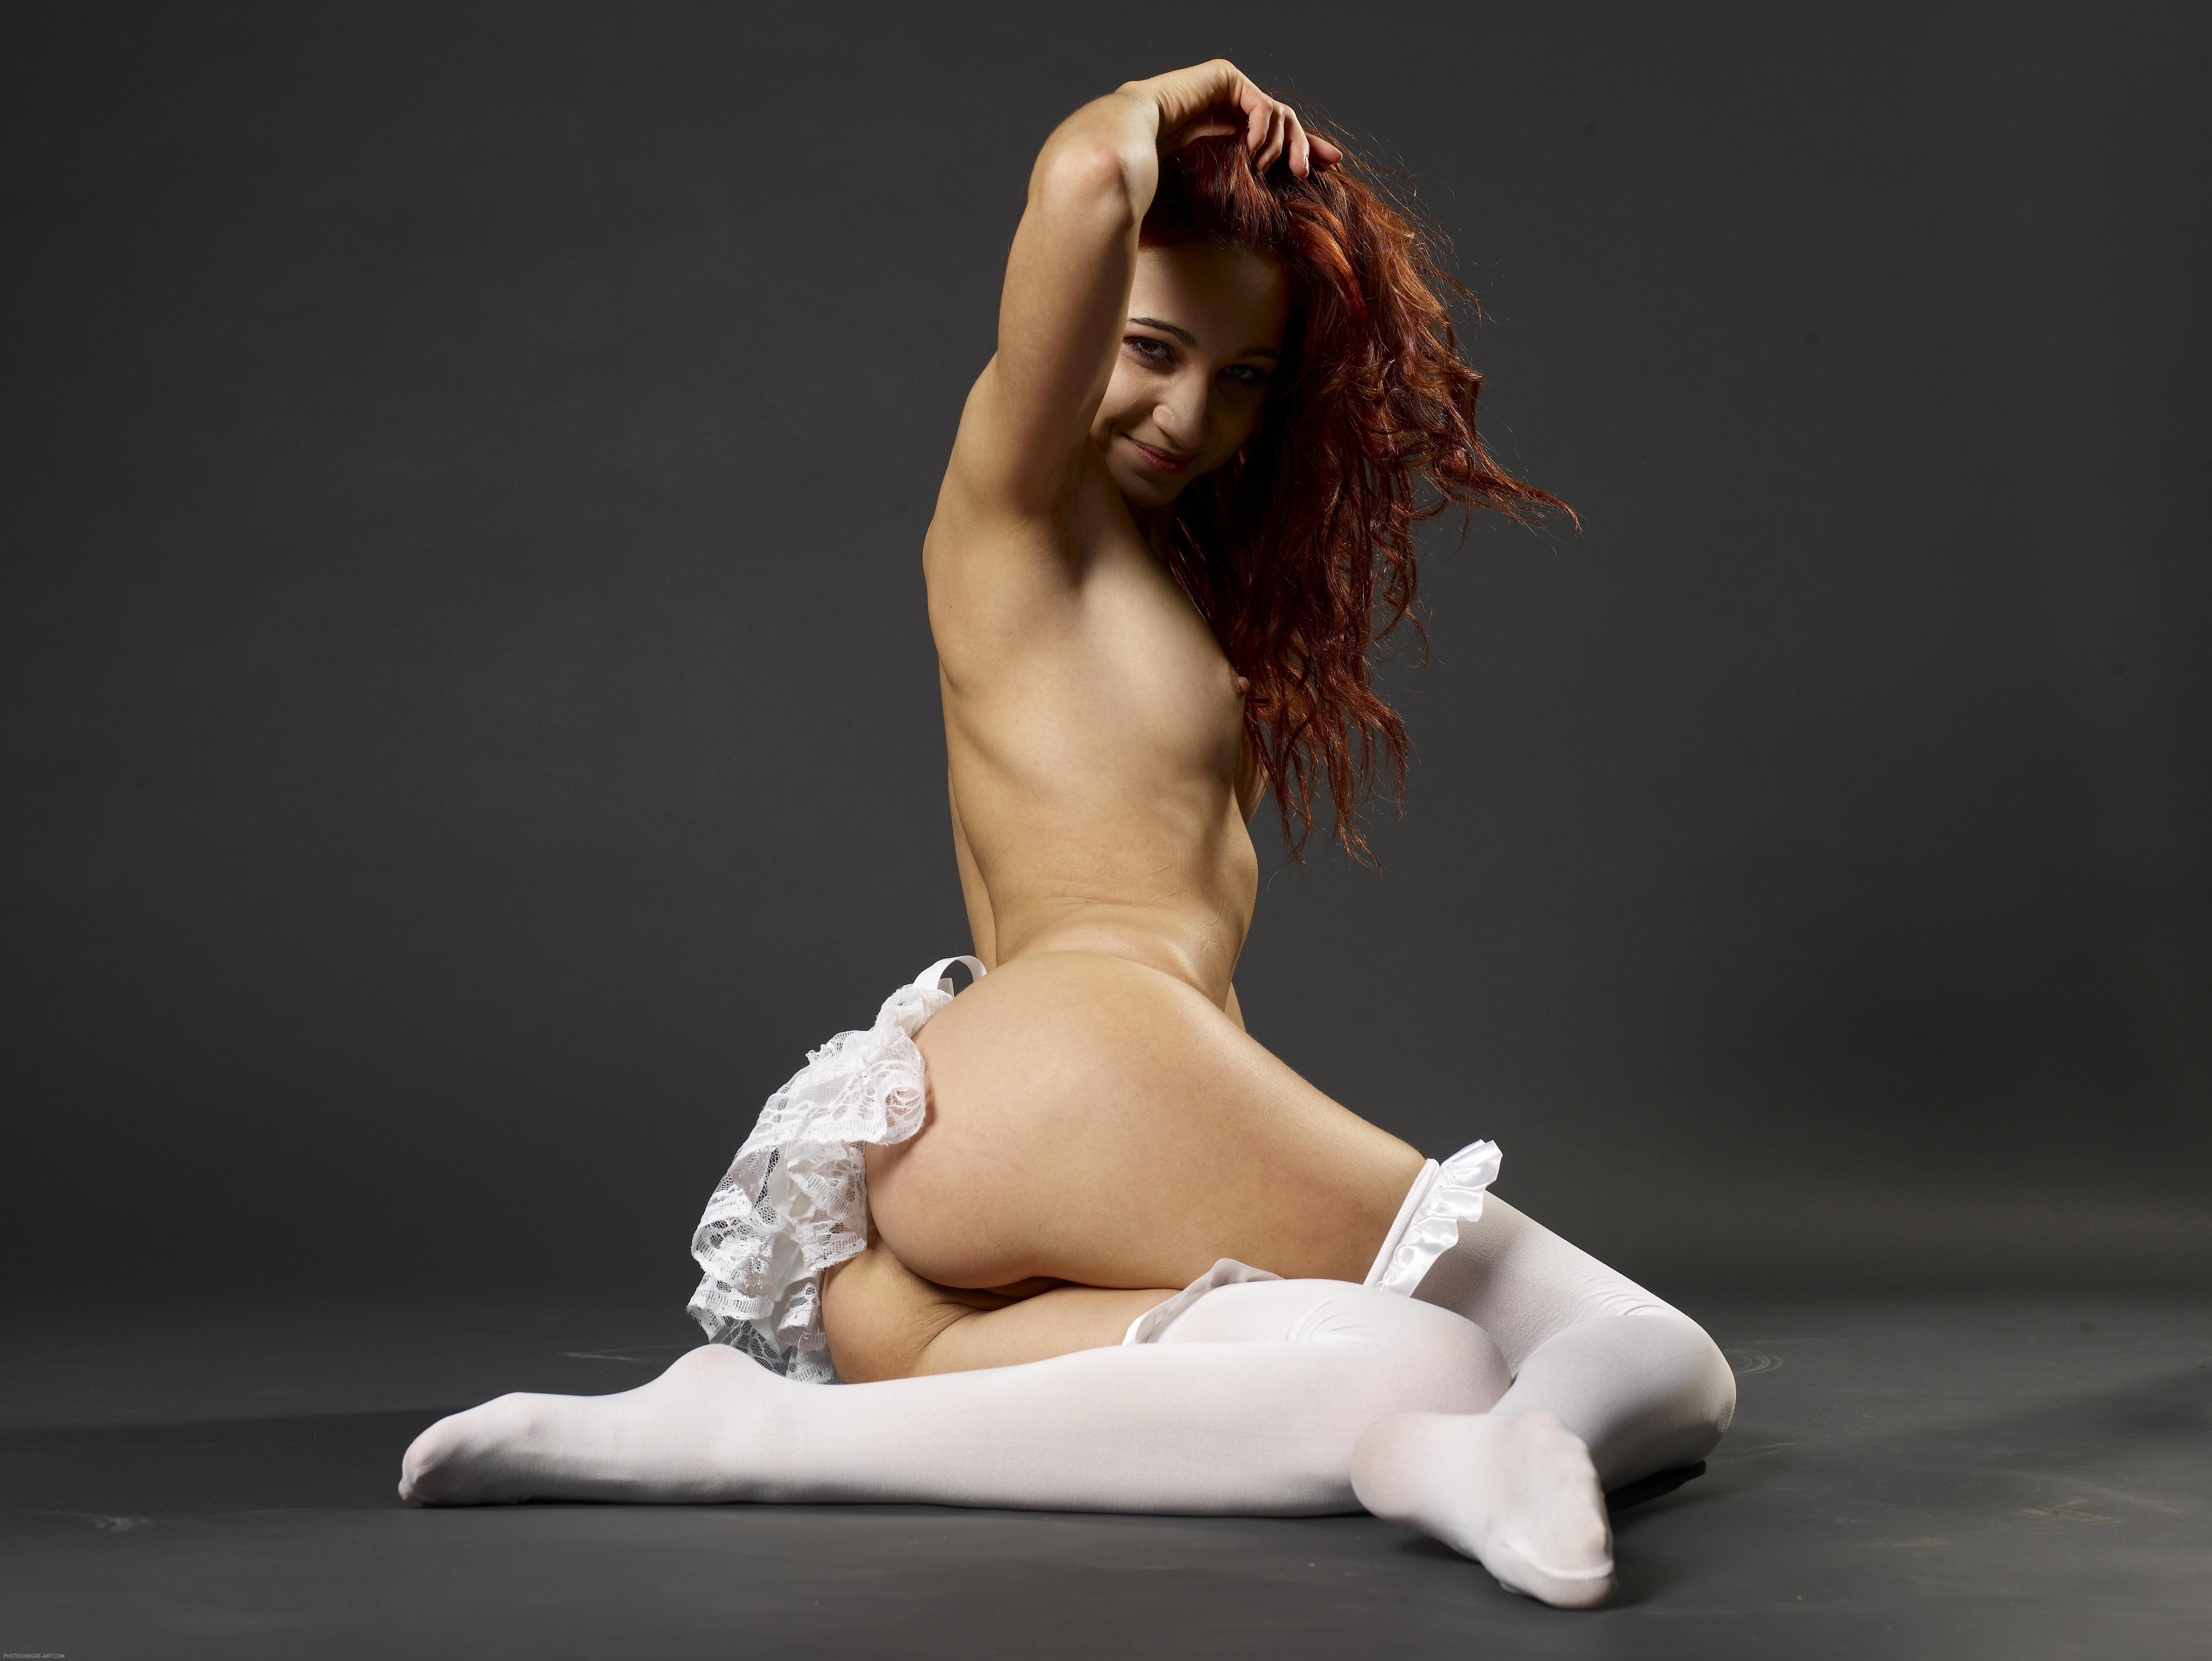 Marlene White Virgin Xxxxl Marlenewhitevirgin Xxxxl